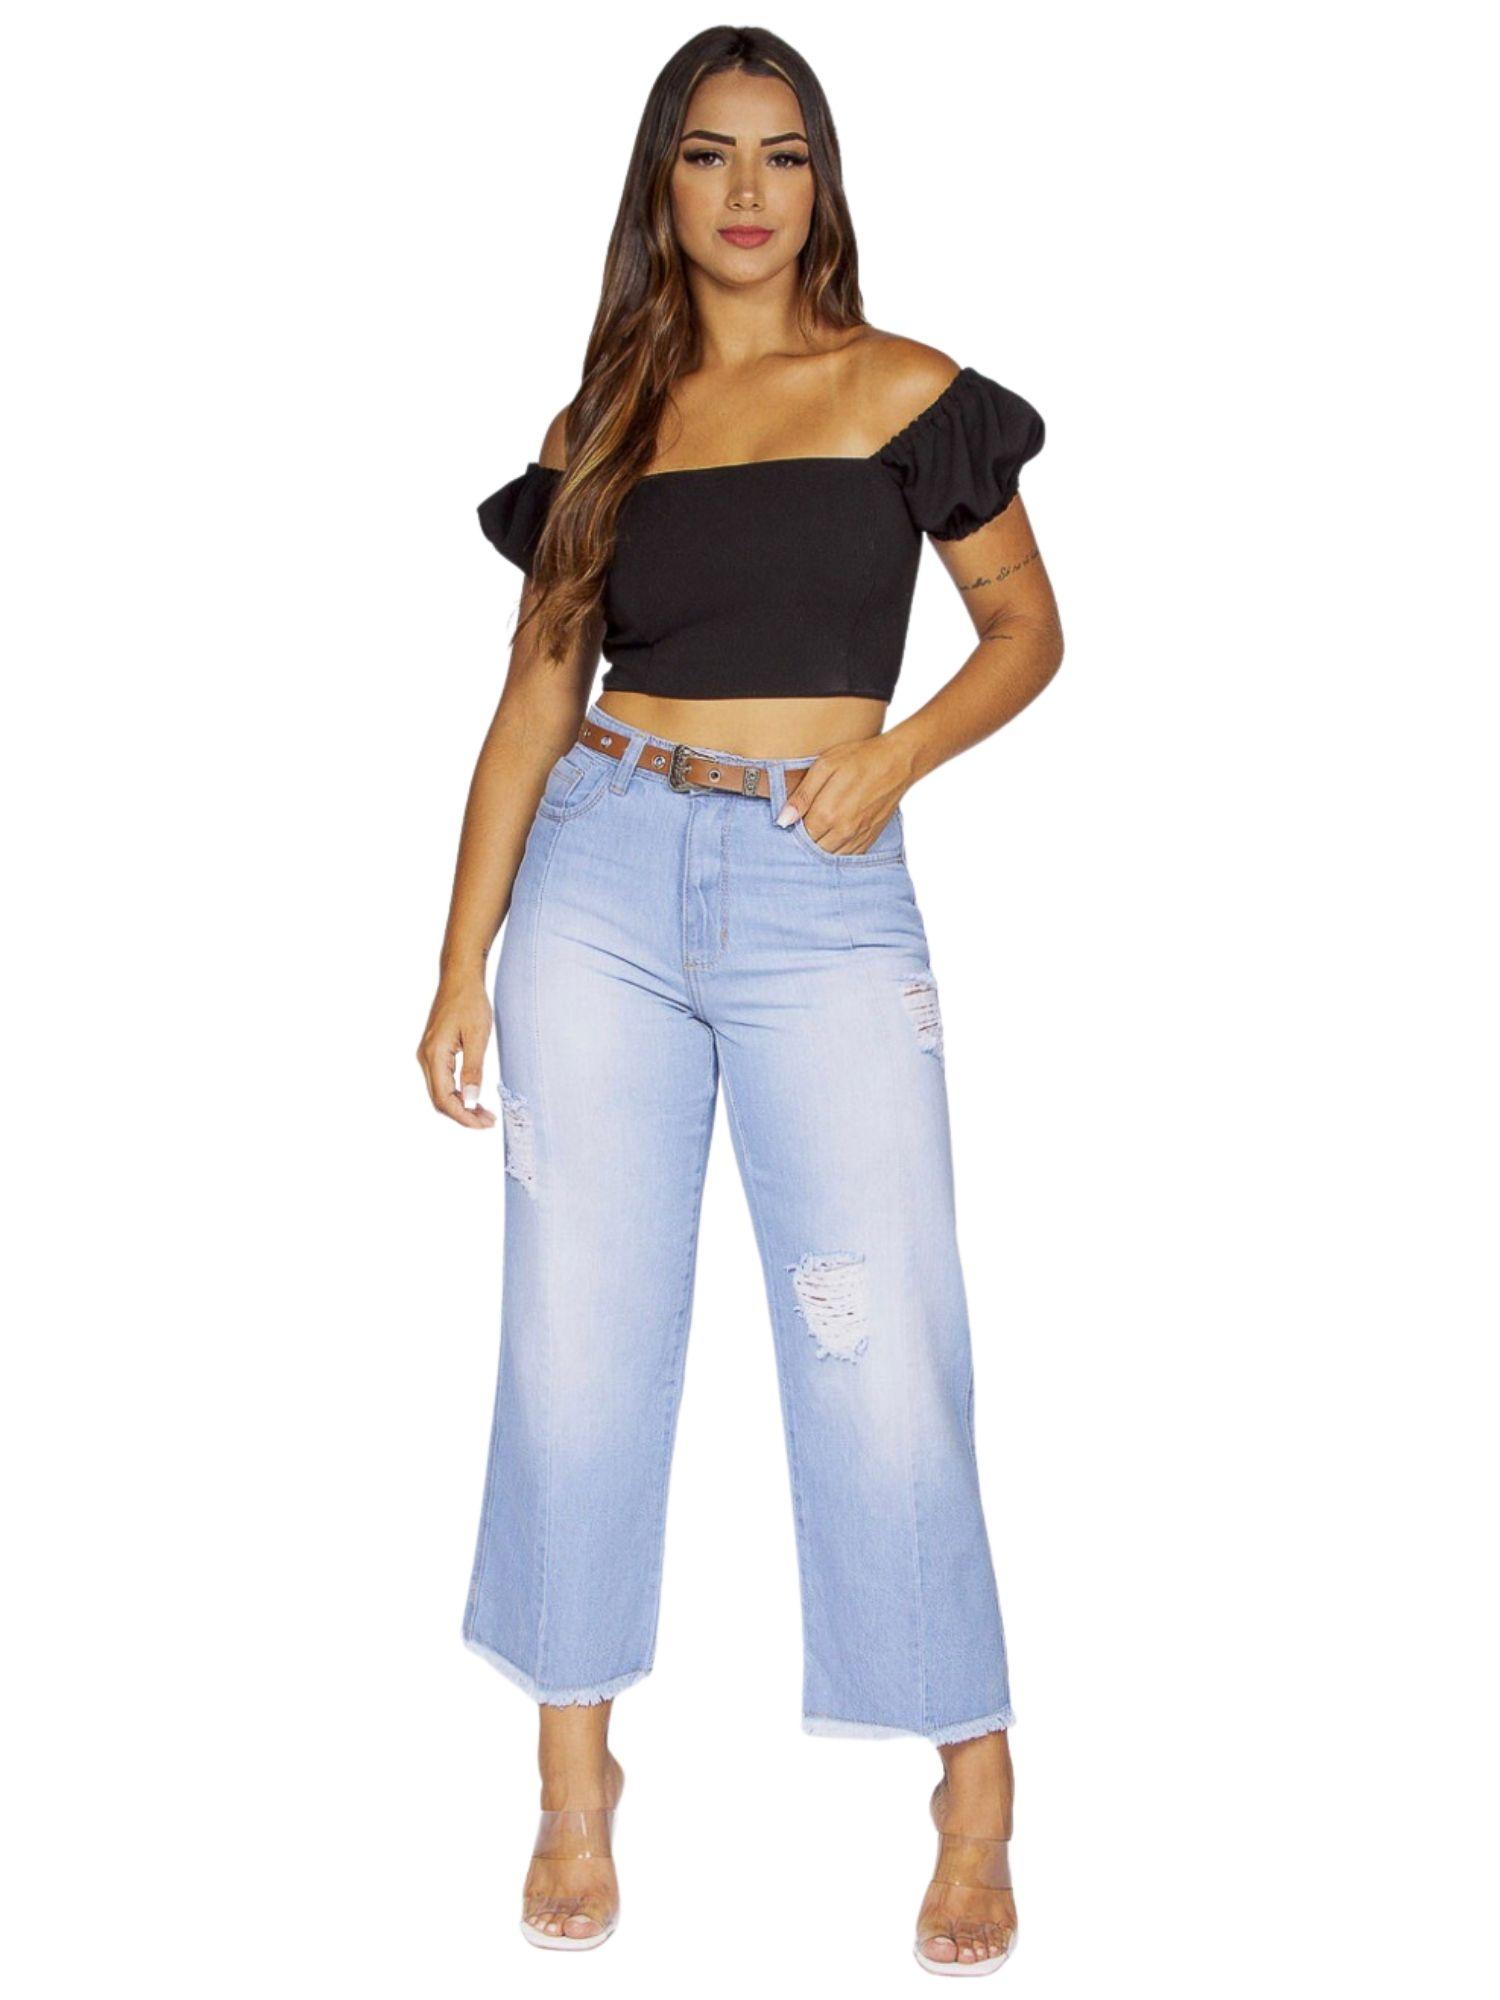 Calça Feminina Pantacourt Tnw Jeans 43577